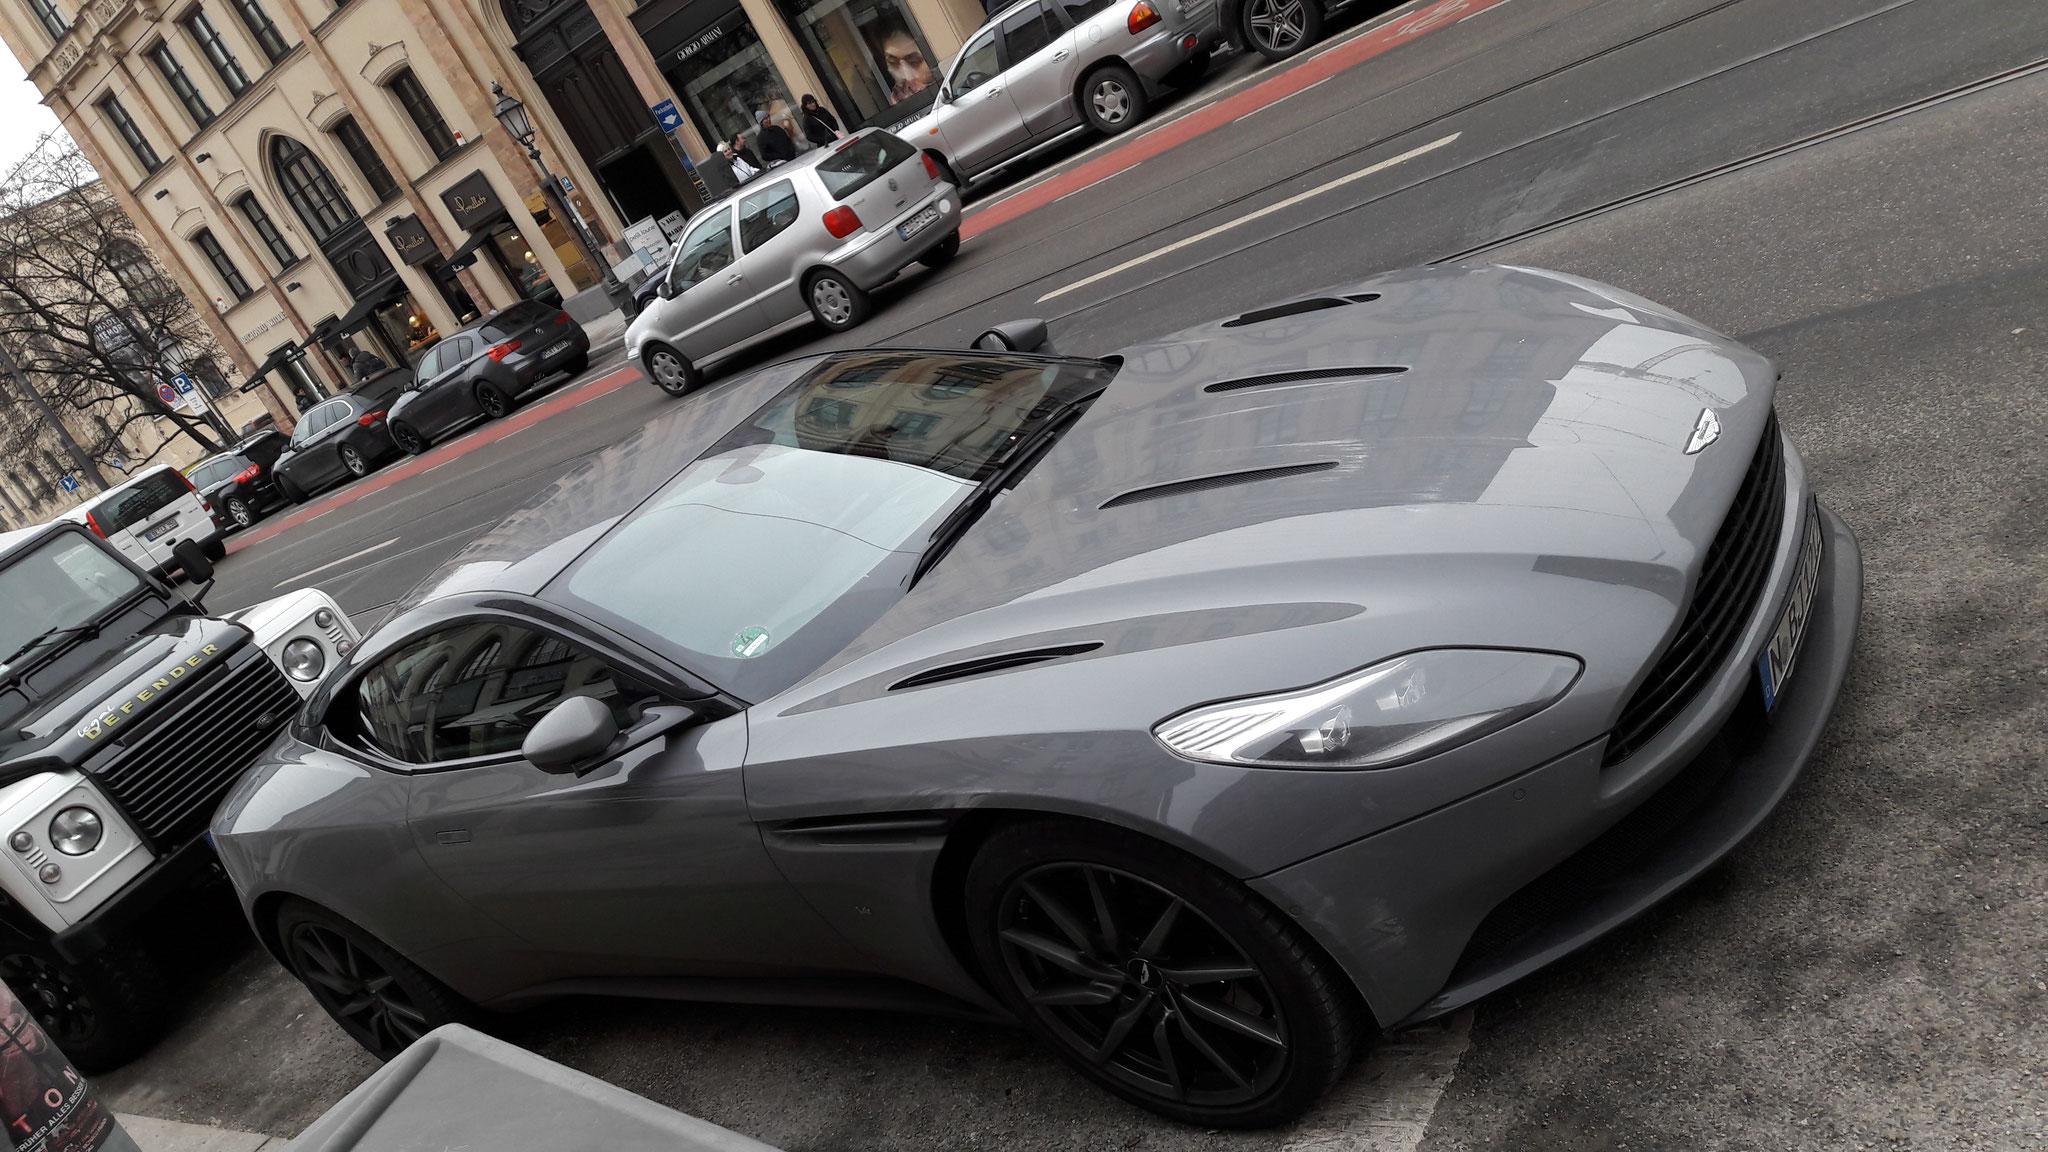 Aston Martin DB11 - N-BJ-1212